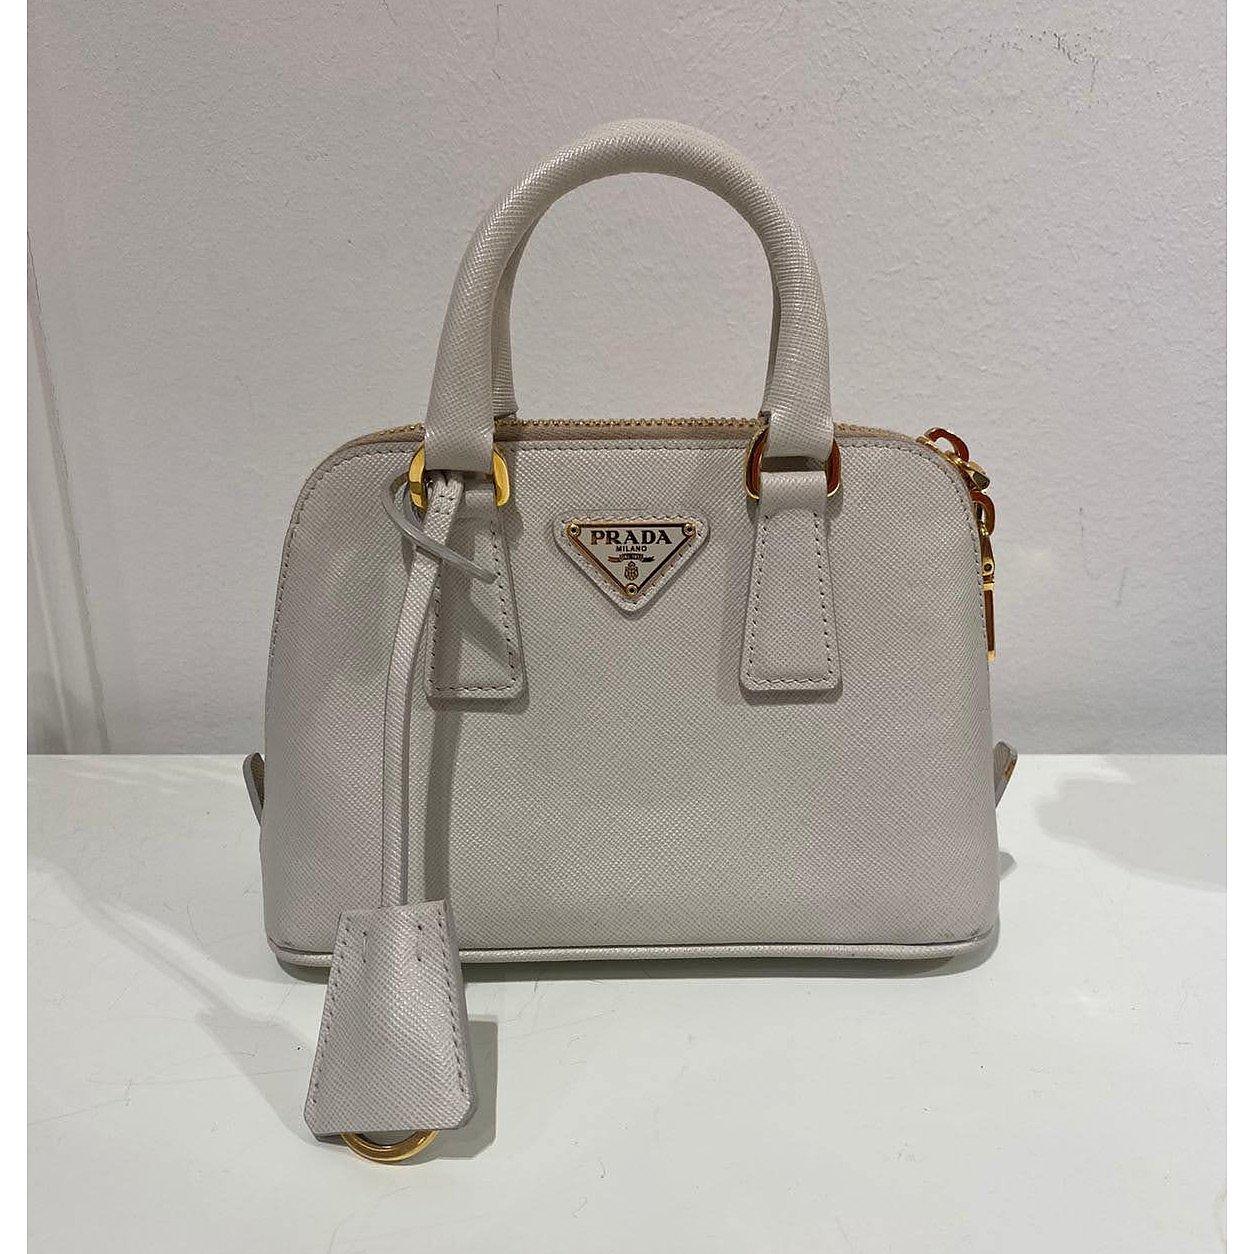 PRADA Mini Leather Bag